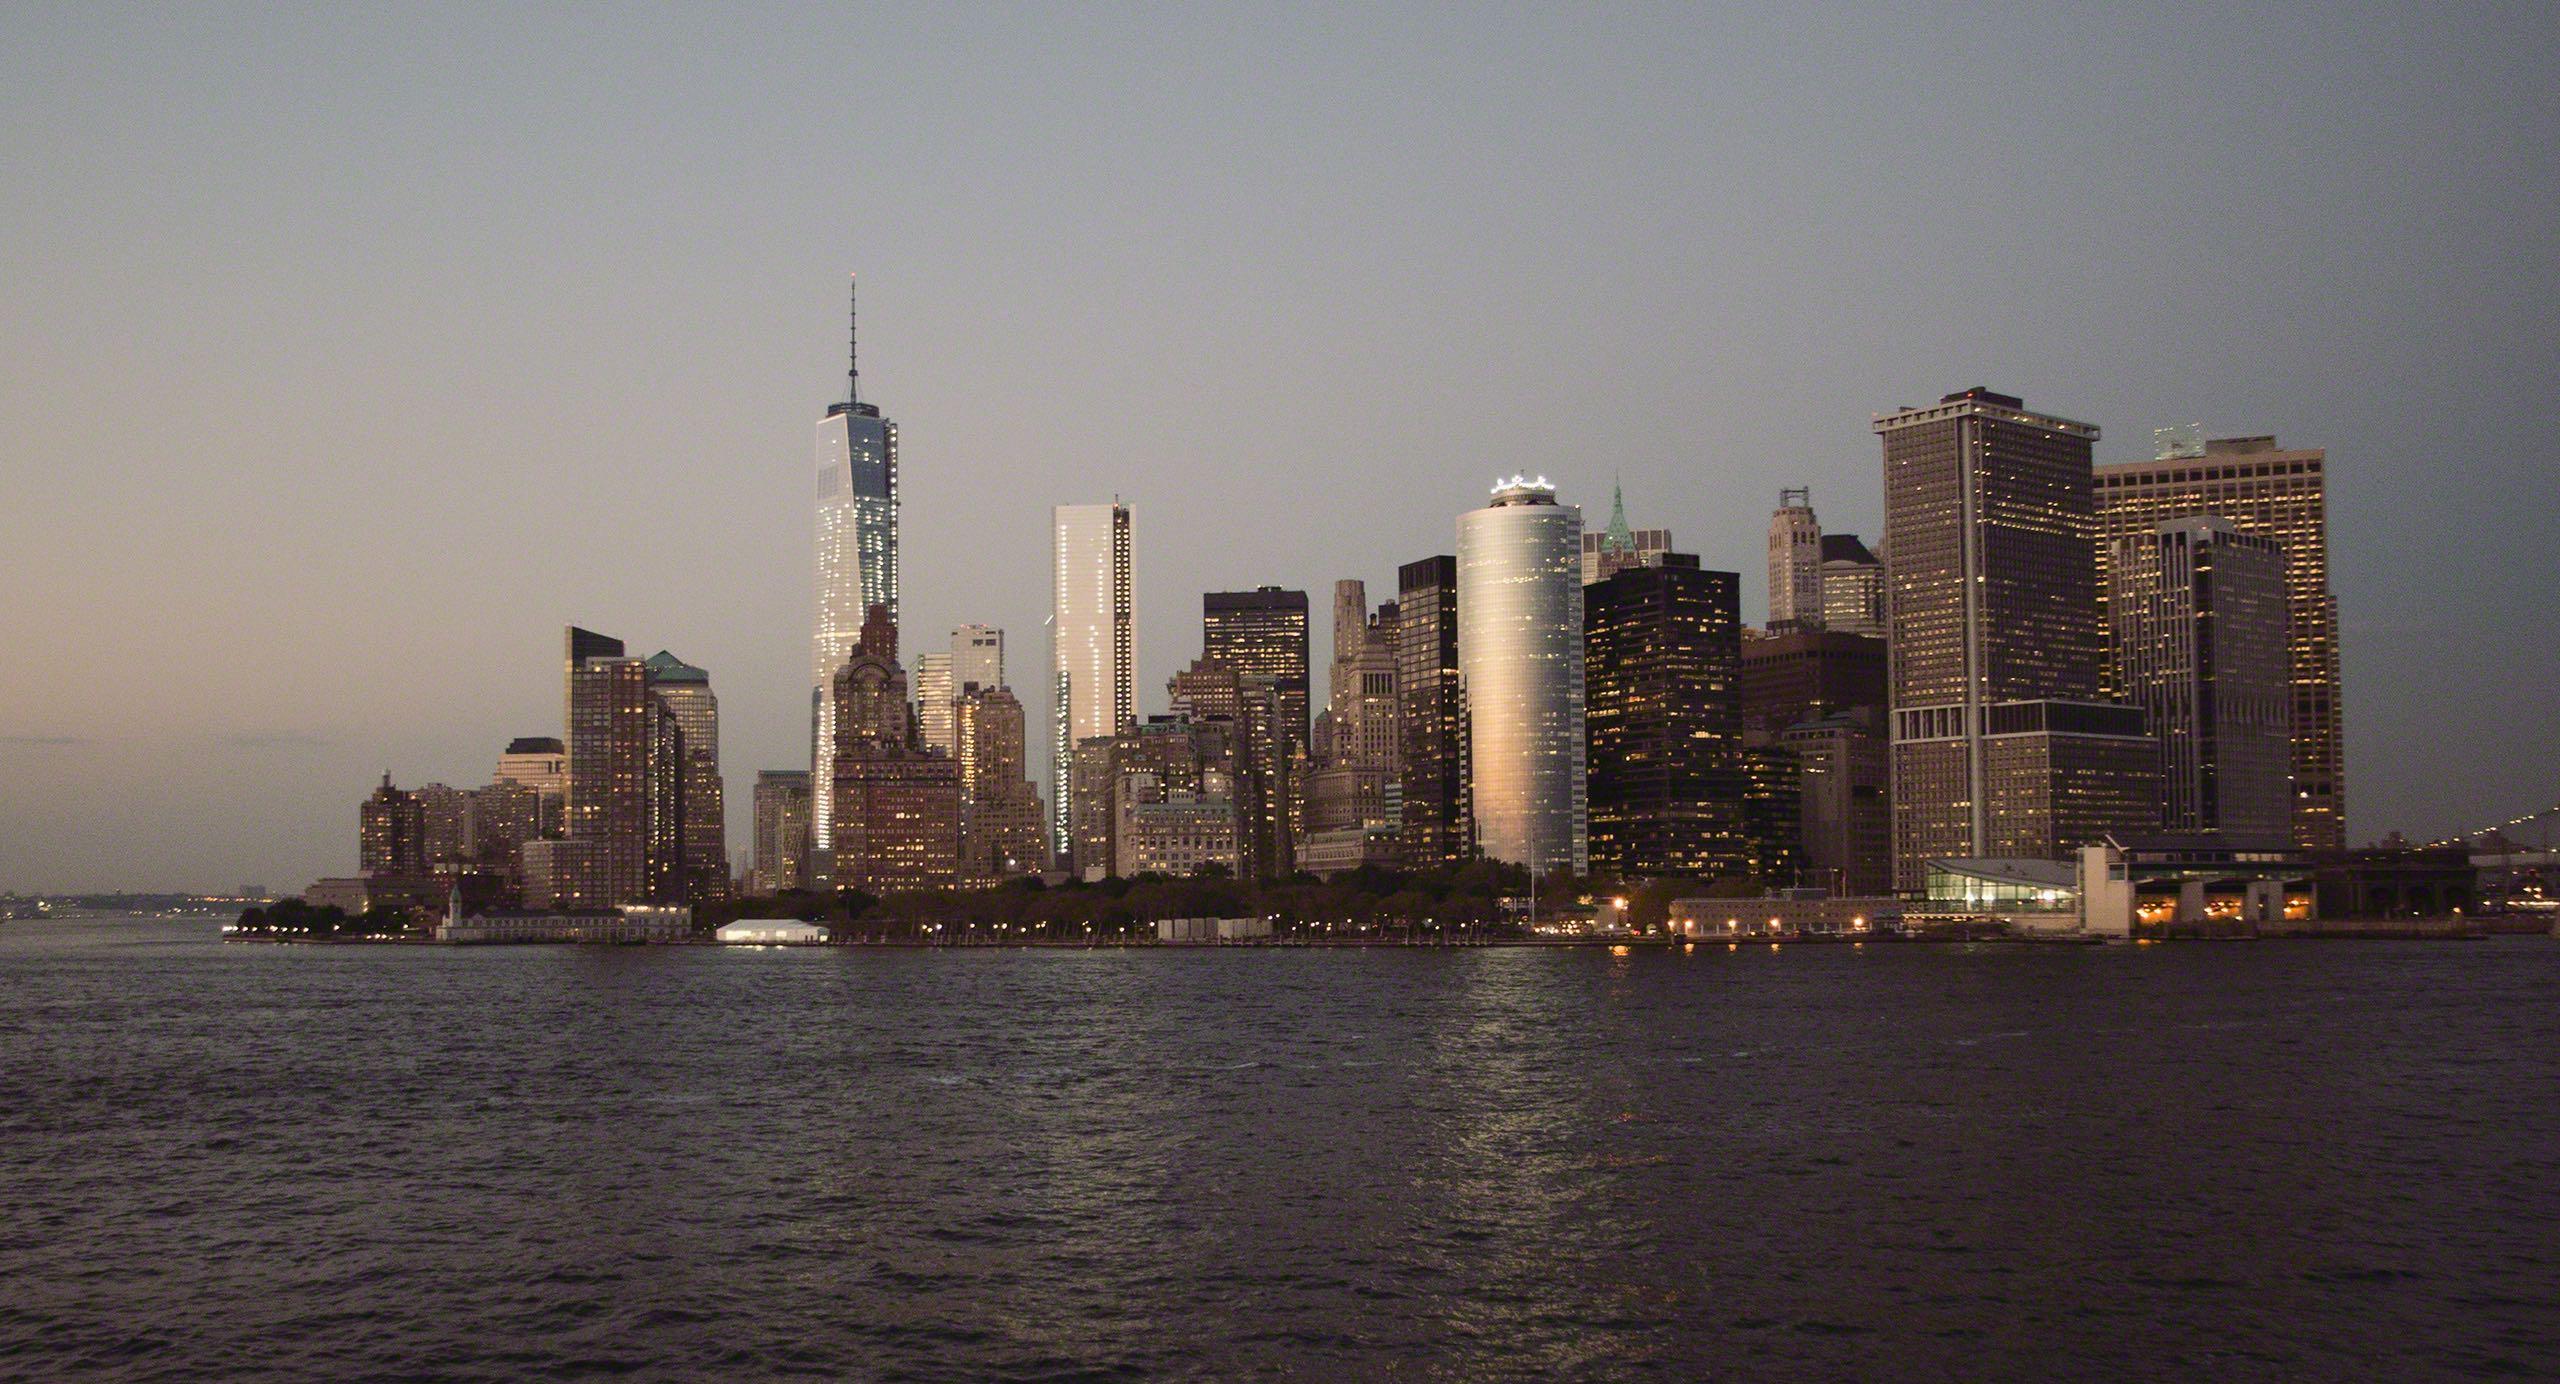 New York Skyline bei Nacht © Mirco Seyfert